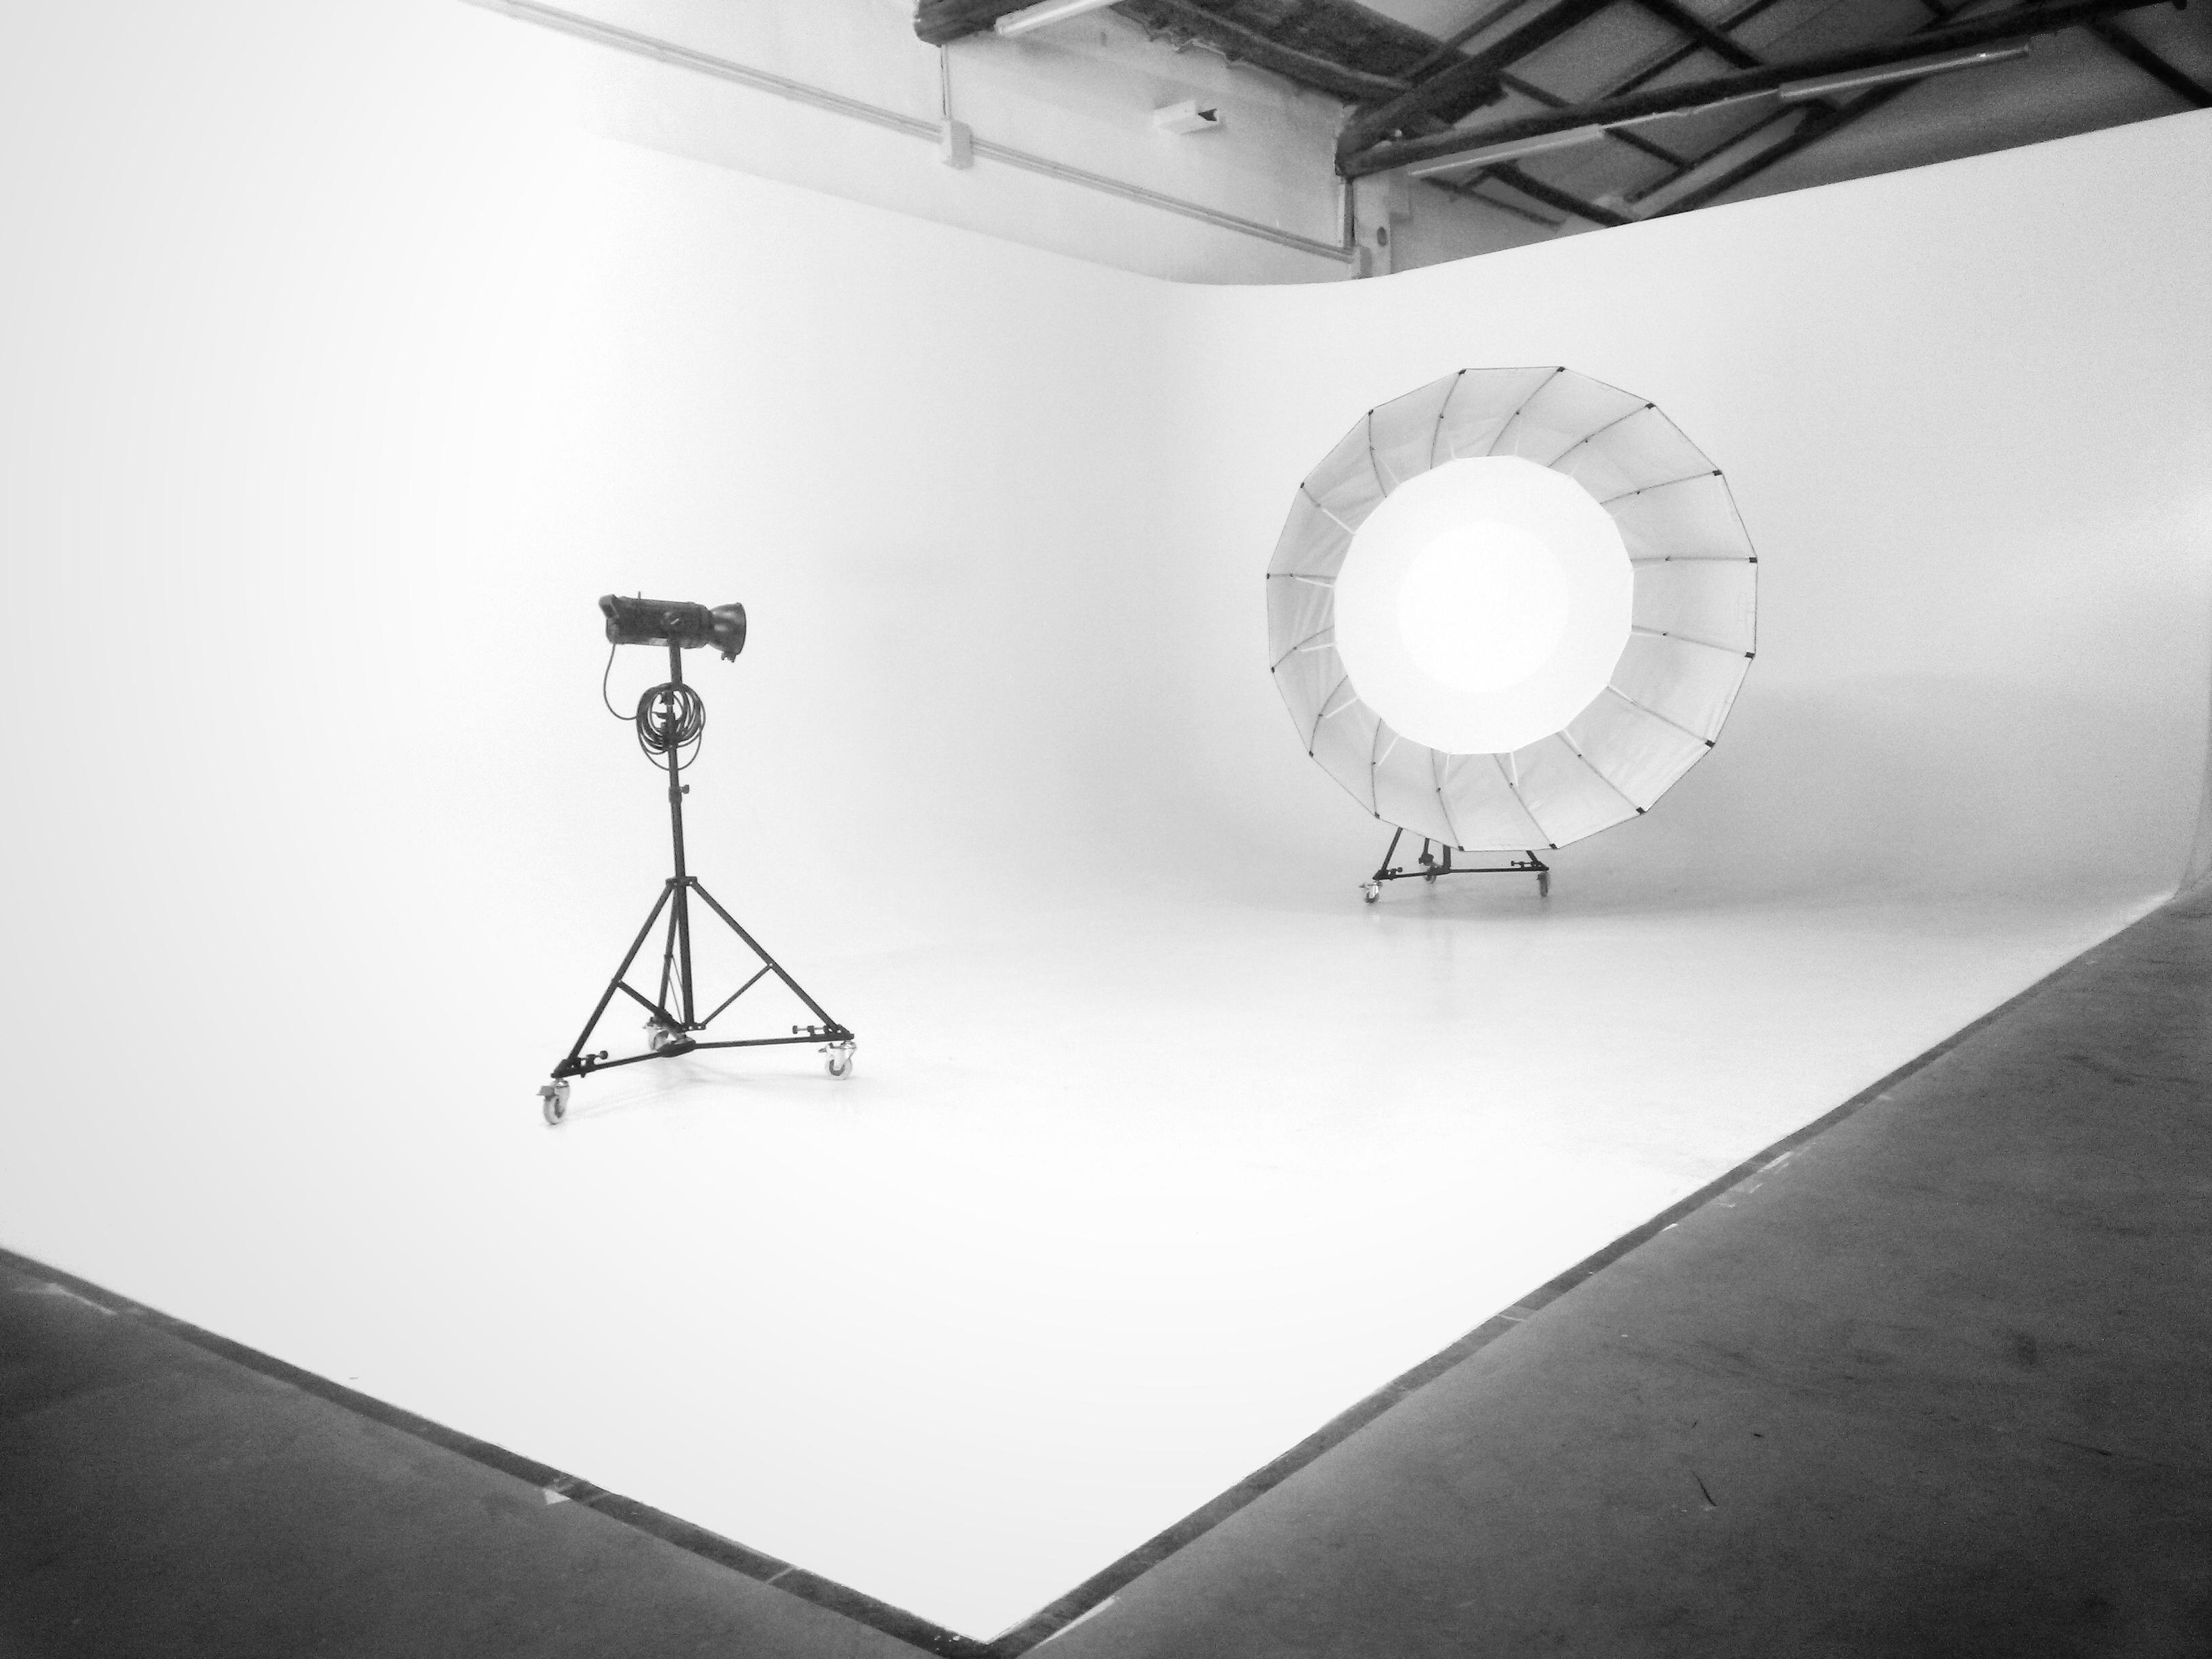 noleggio limbo cyclorama roma sala posa studio fotografico14